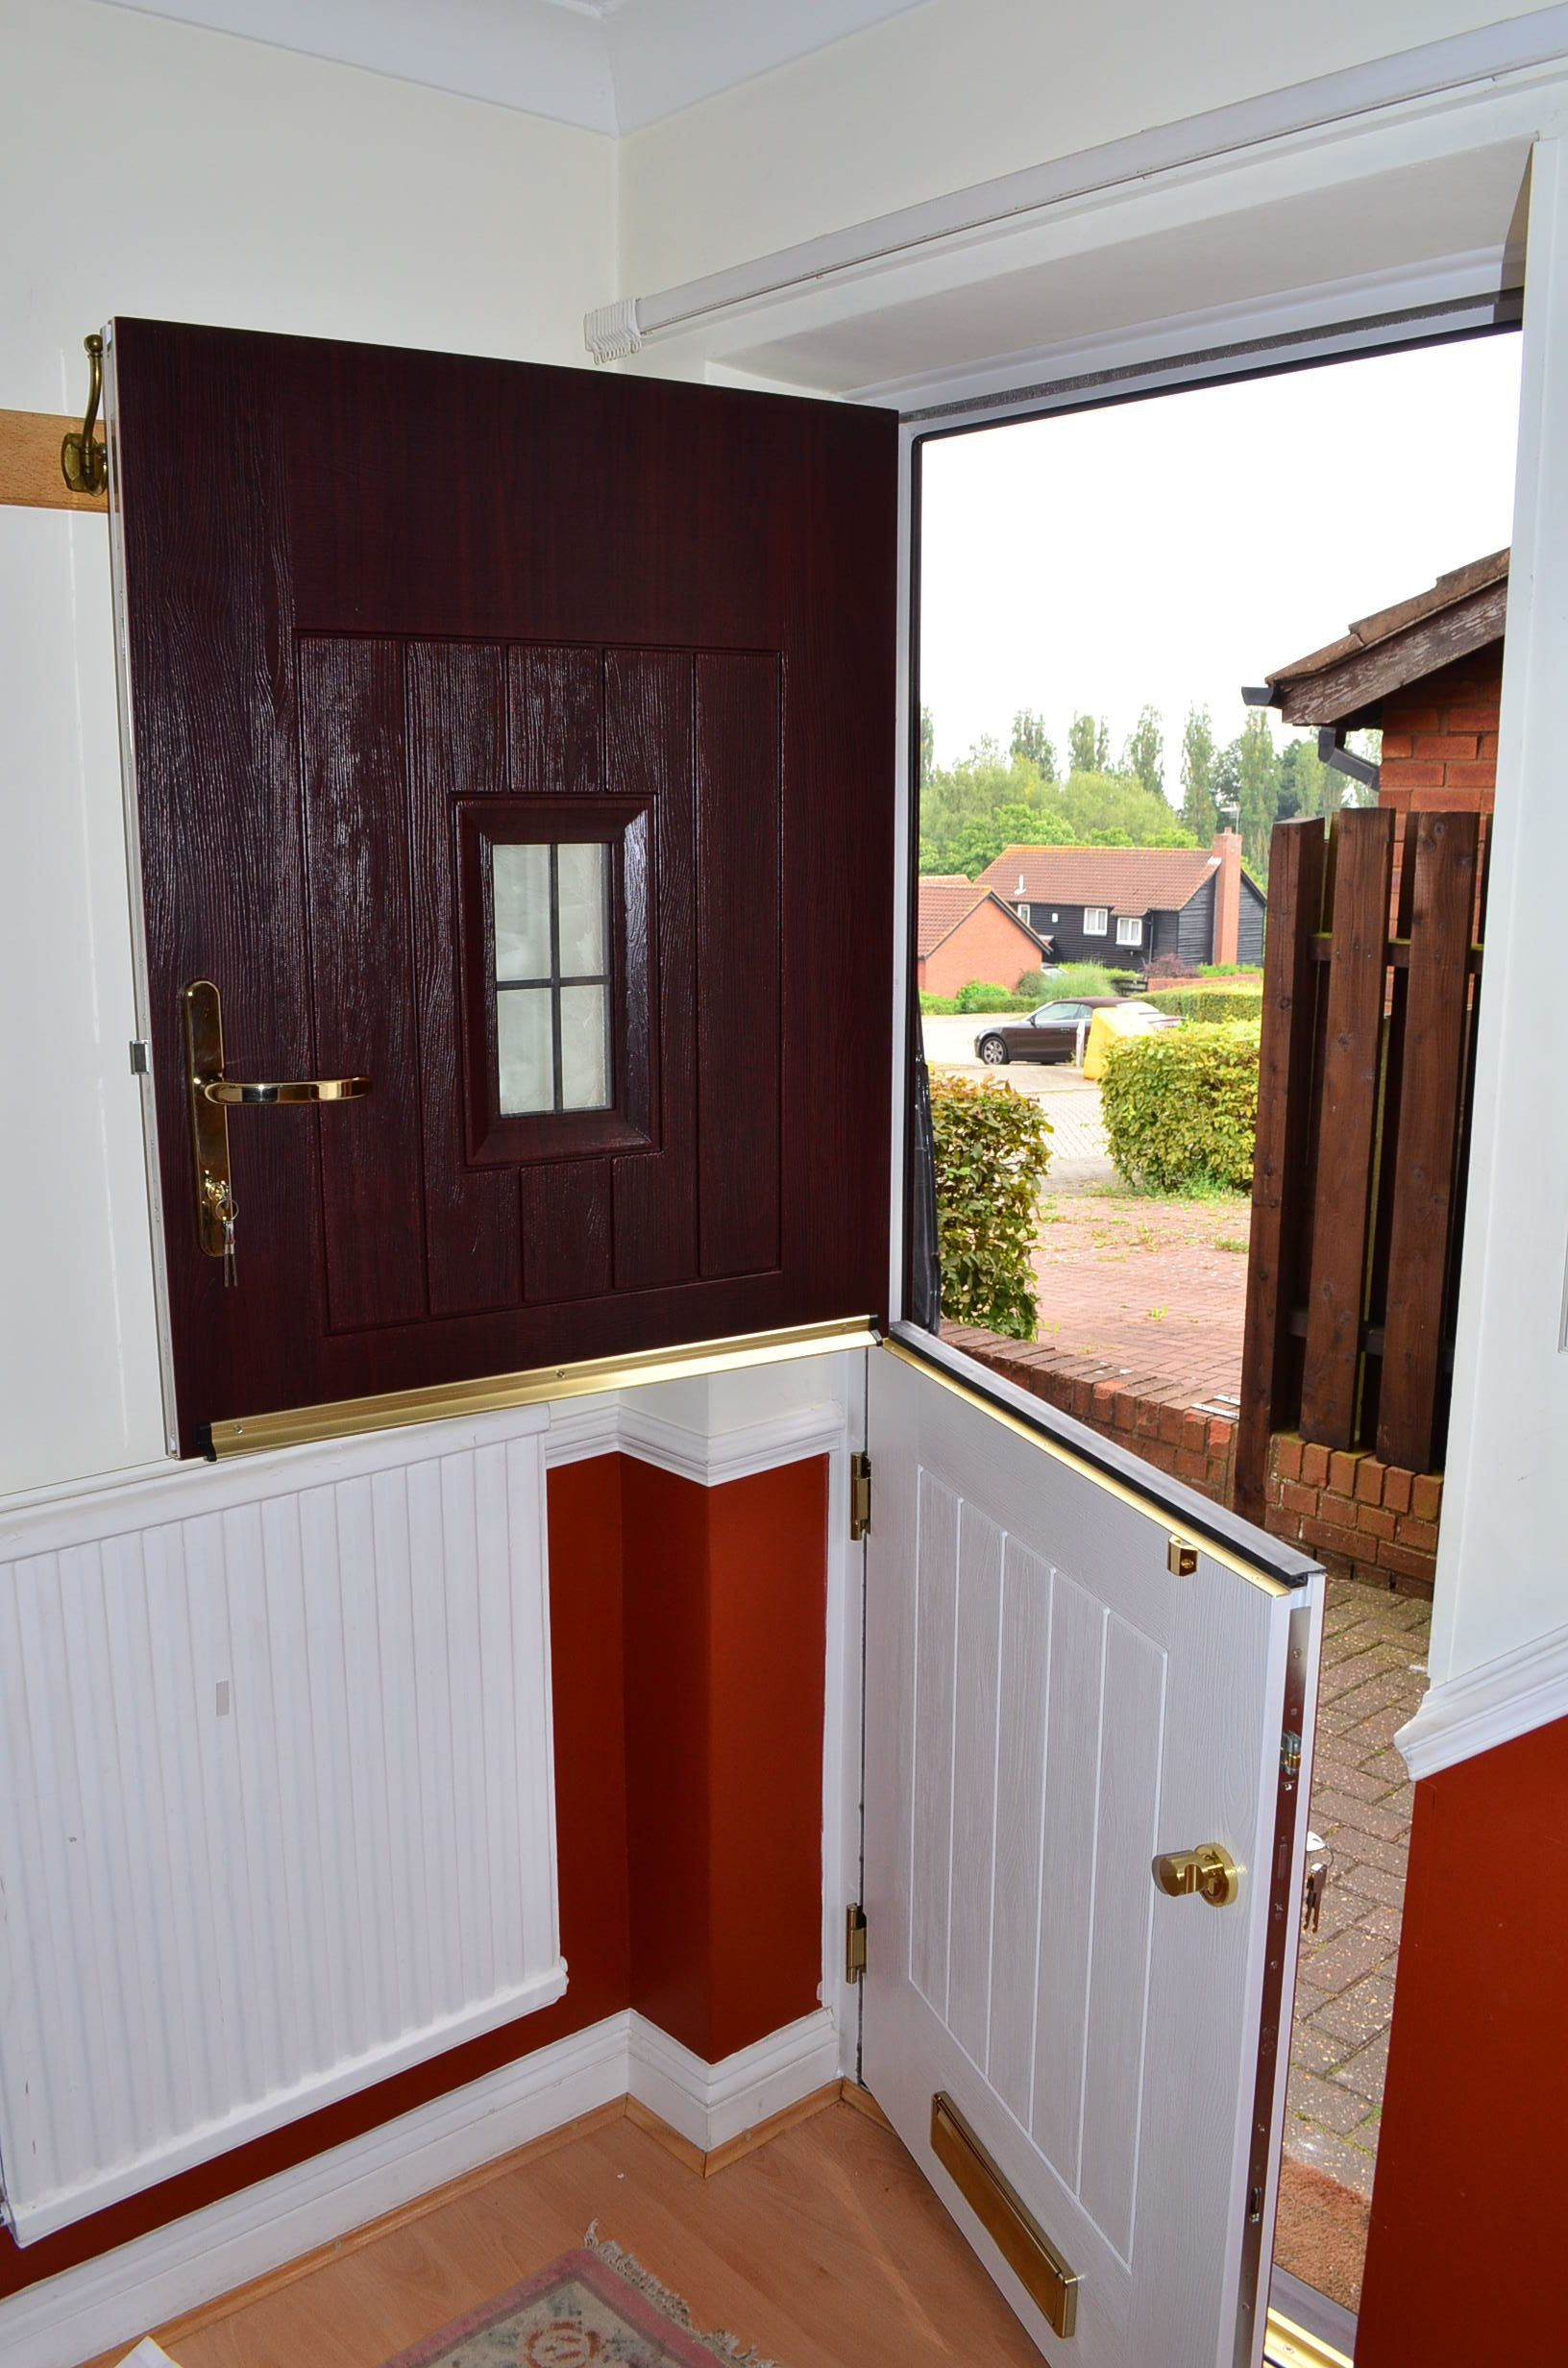 Doors & Rockdoor Stable Spy Square Lead http://www.verysecuredoors.co.uk ...